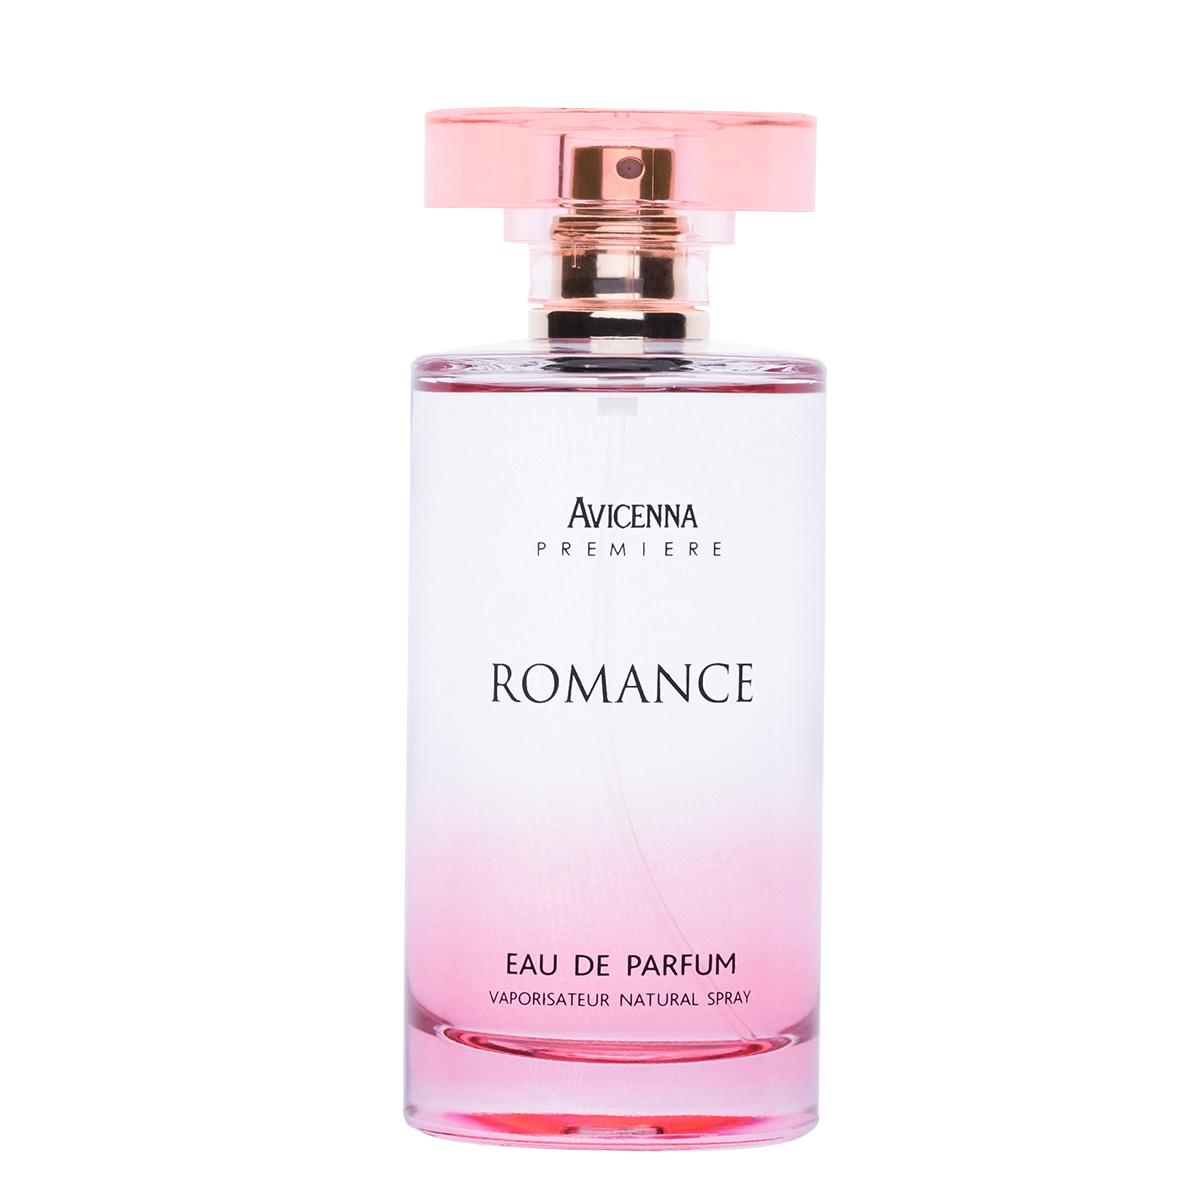 AVICENNA PREMIERE ROMANCE EDP 100 ML